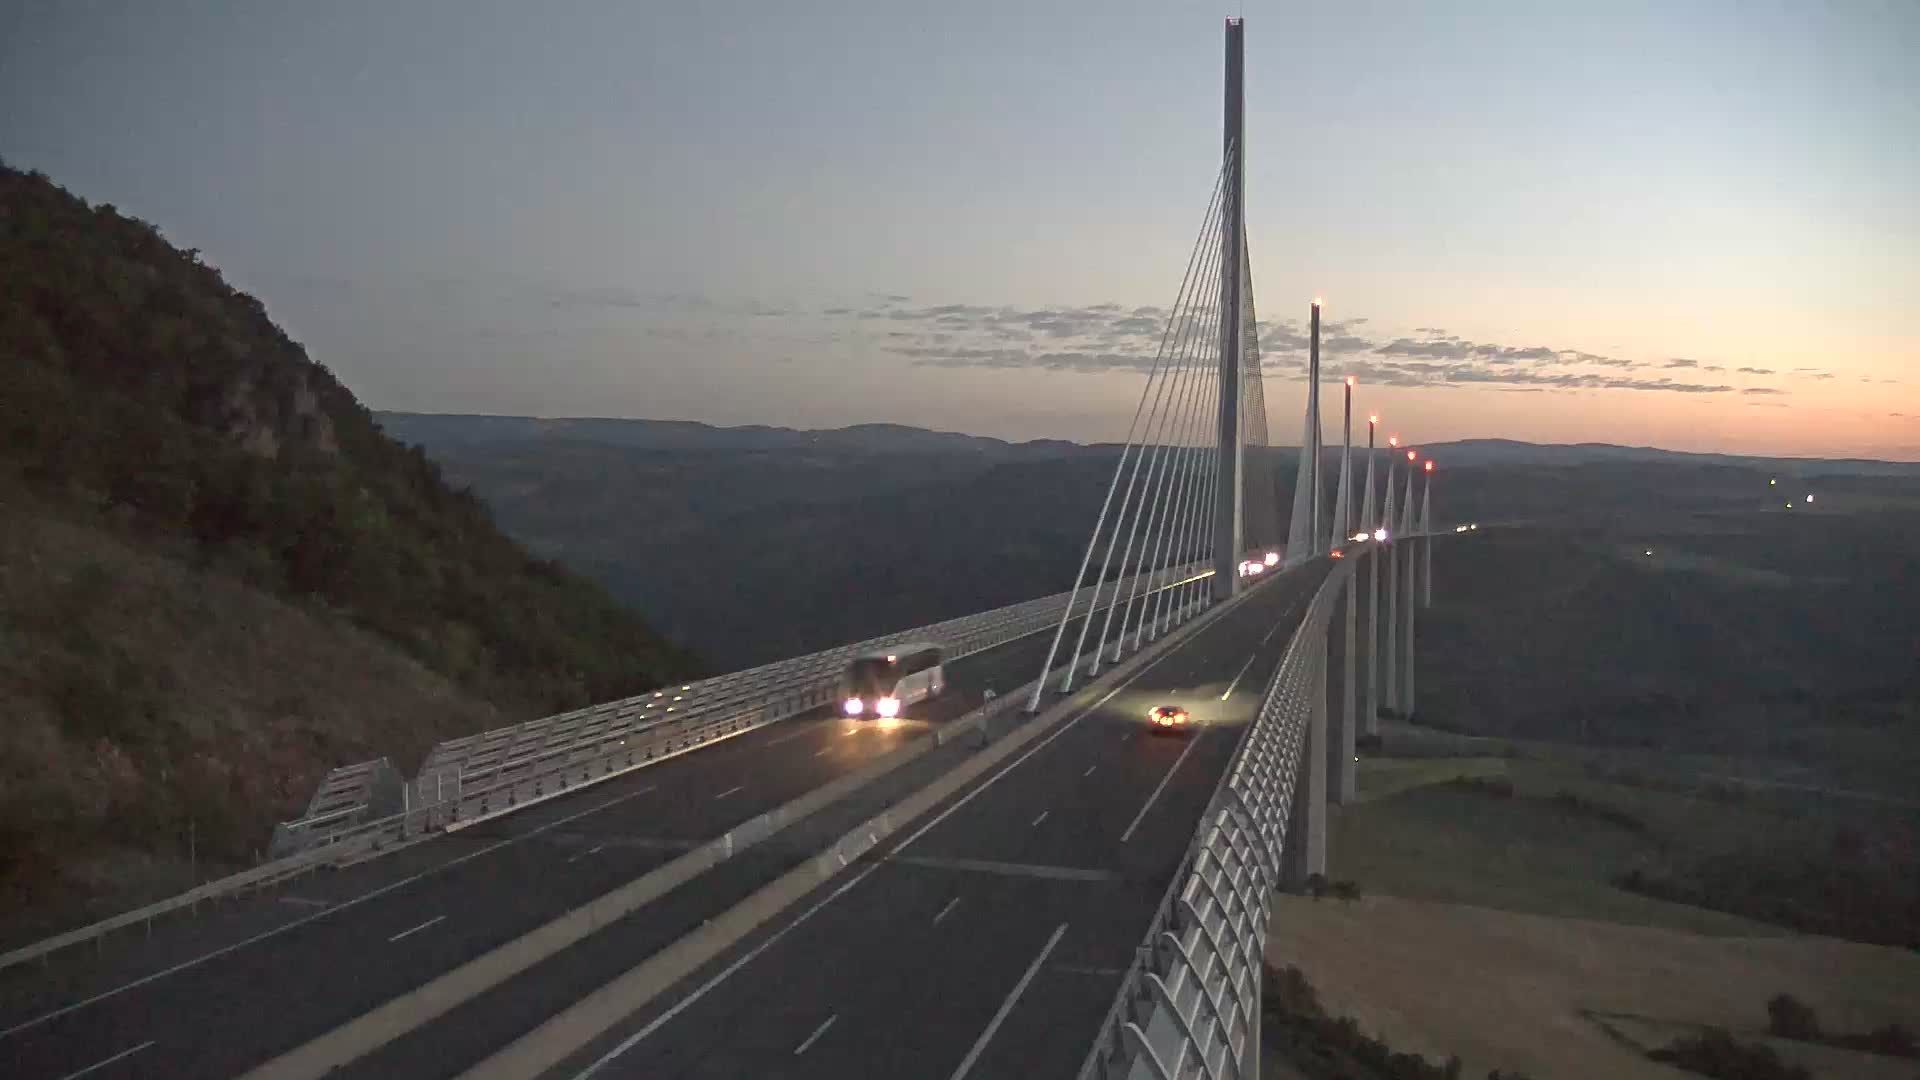 Millau Viaduct Wed. 05:47